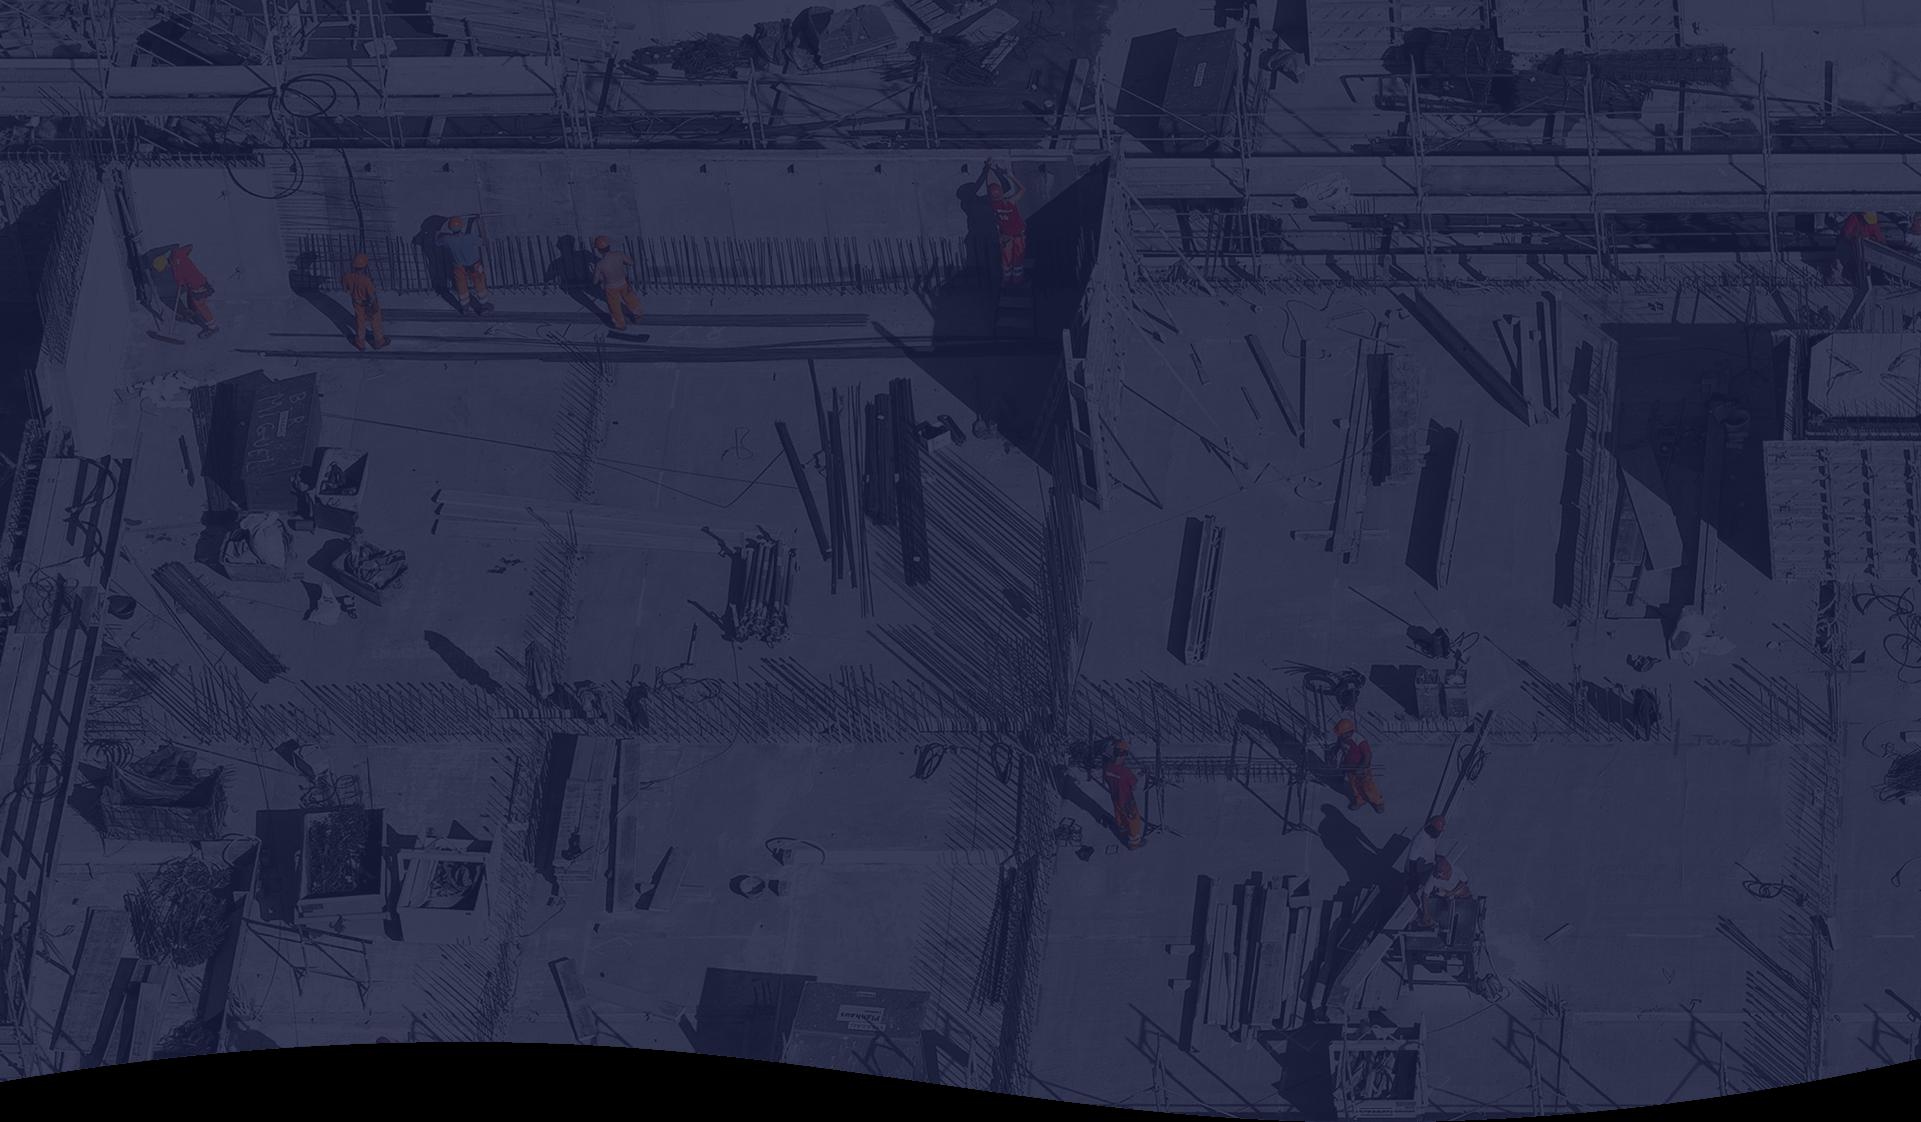 Protecht webinar series background showing construction site